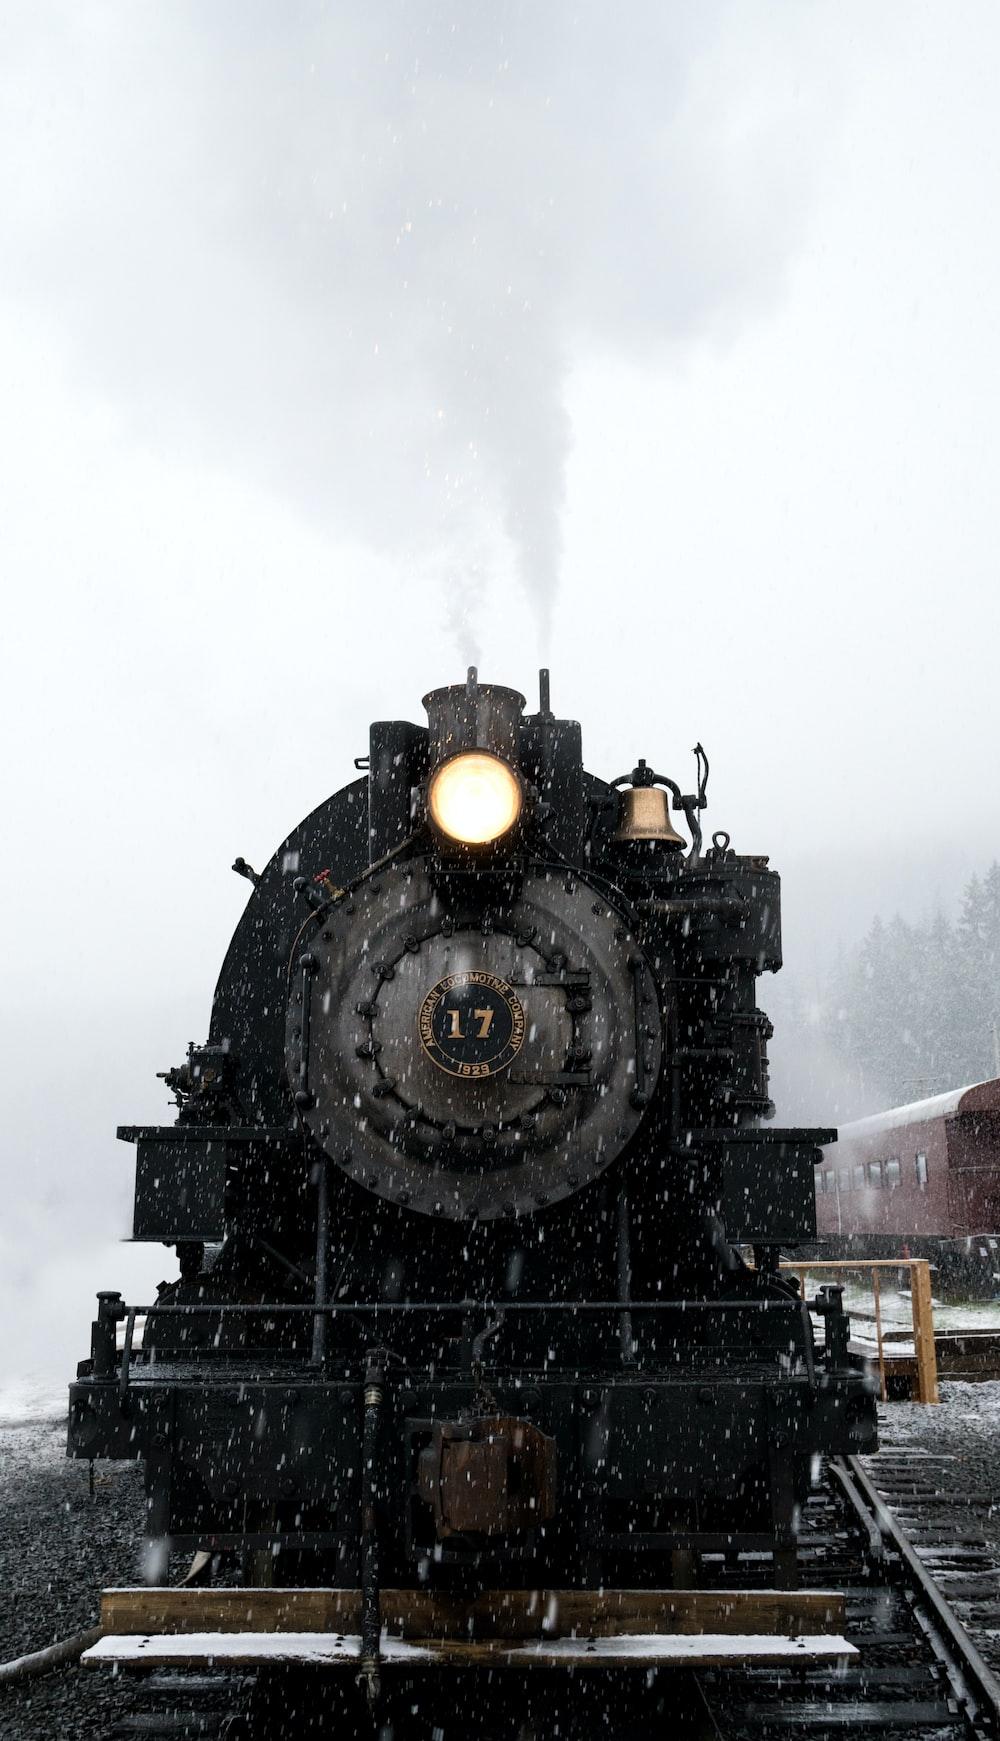 black train on railway at daytime